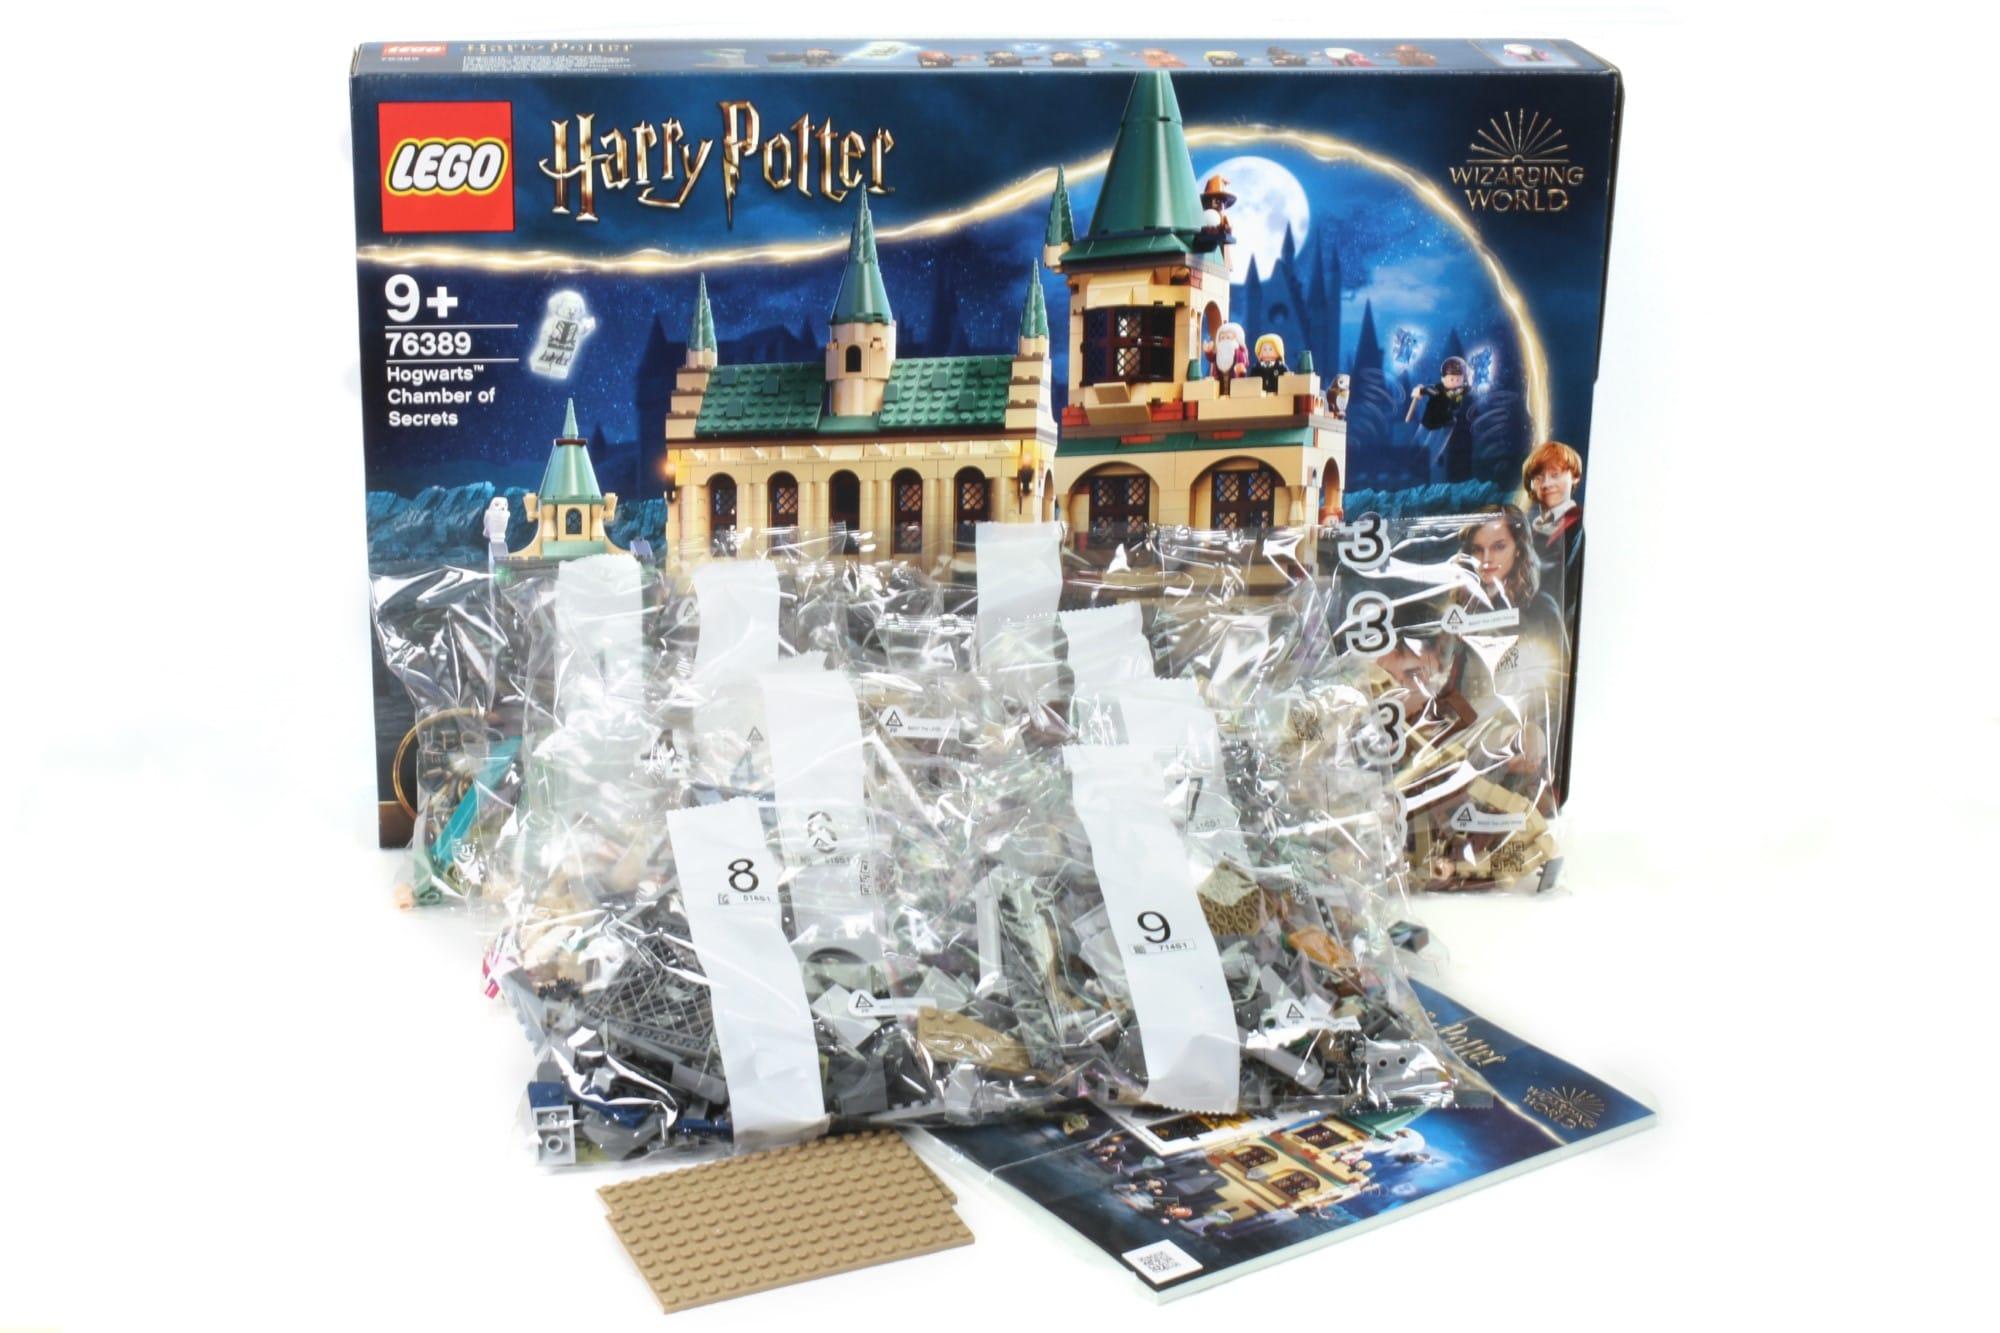 LEGO Harry Potter 76389 Hogwarts Kammer Des Schreckens Box 3